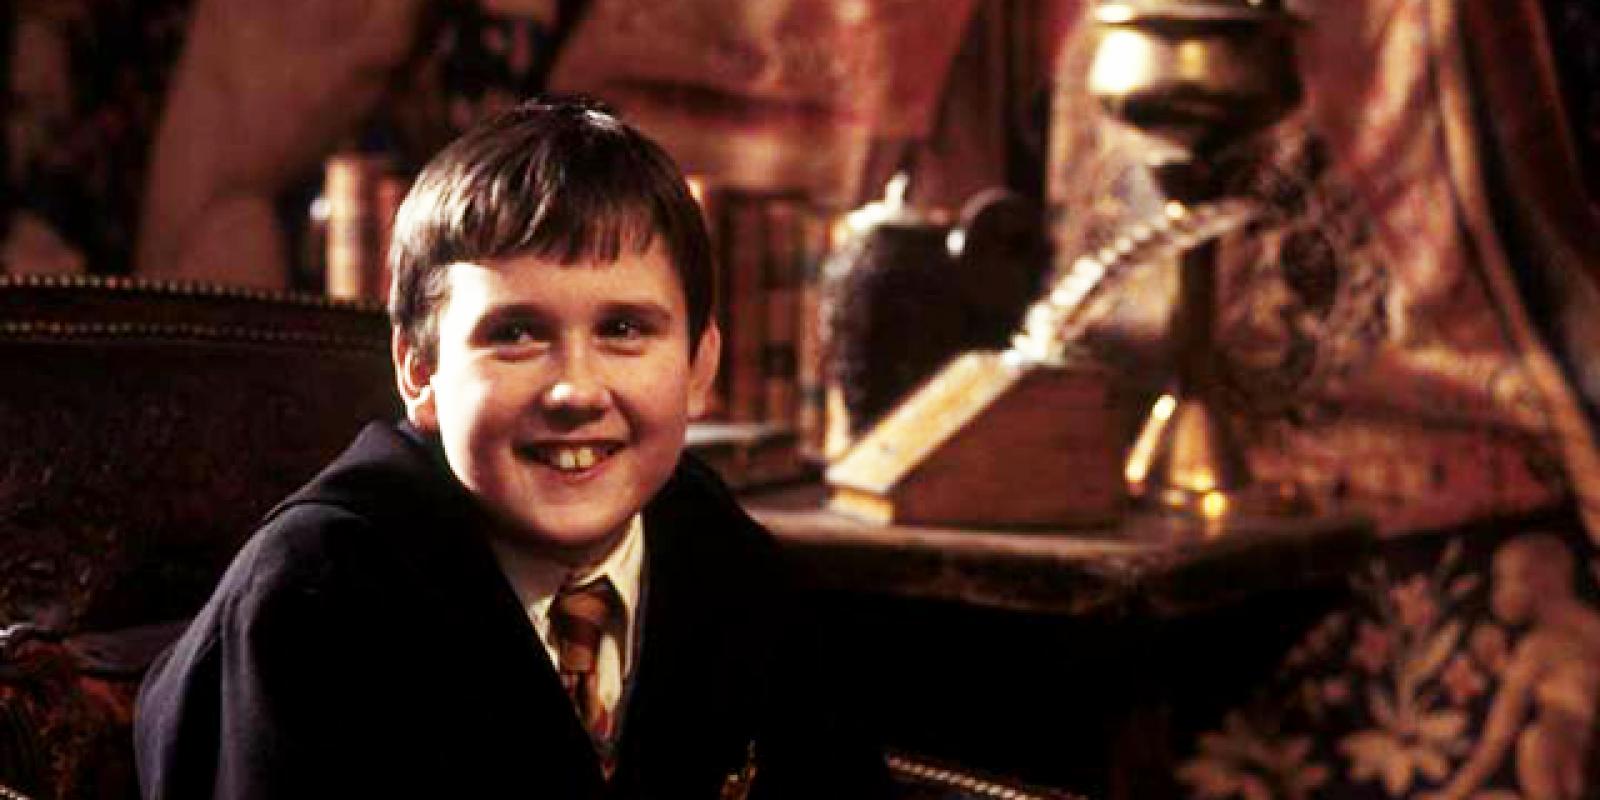 . Imagen Por: Facebook/Harry Potter